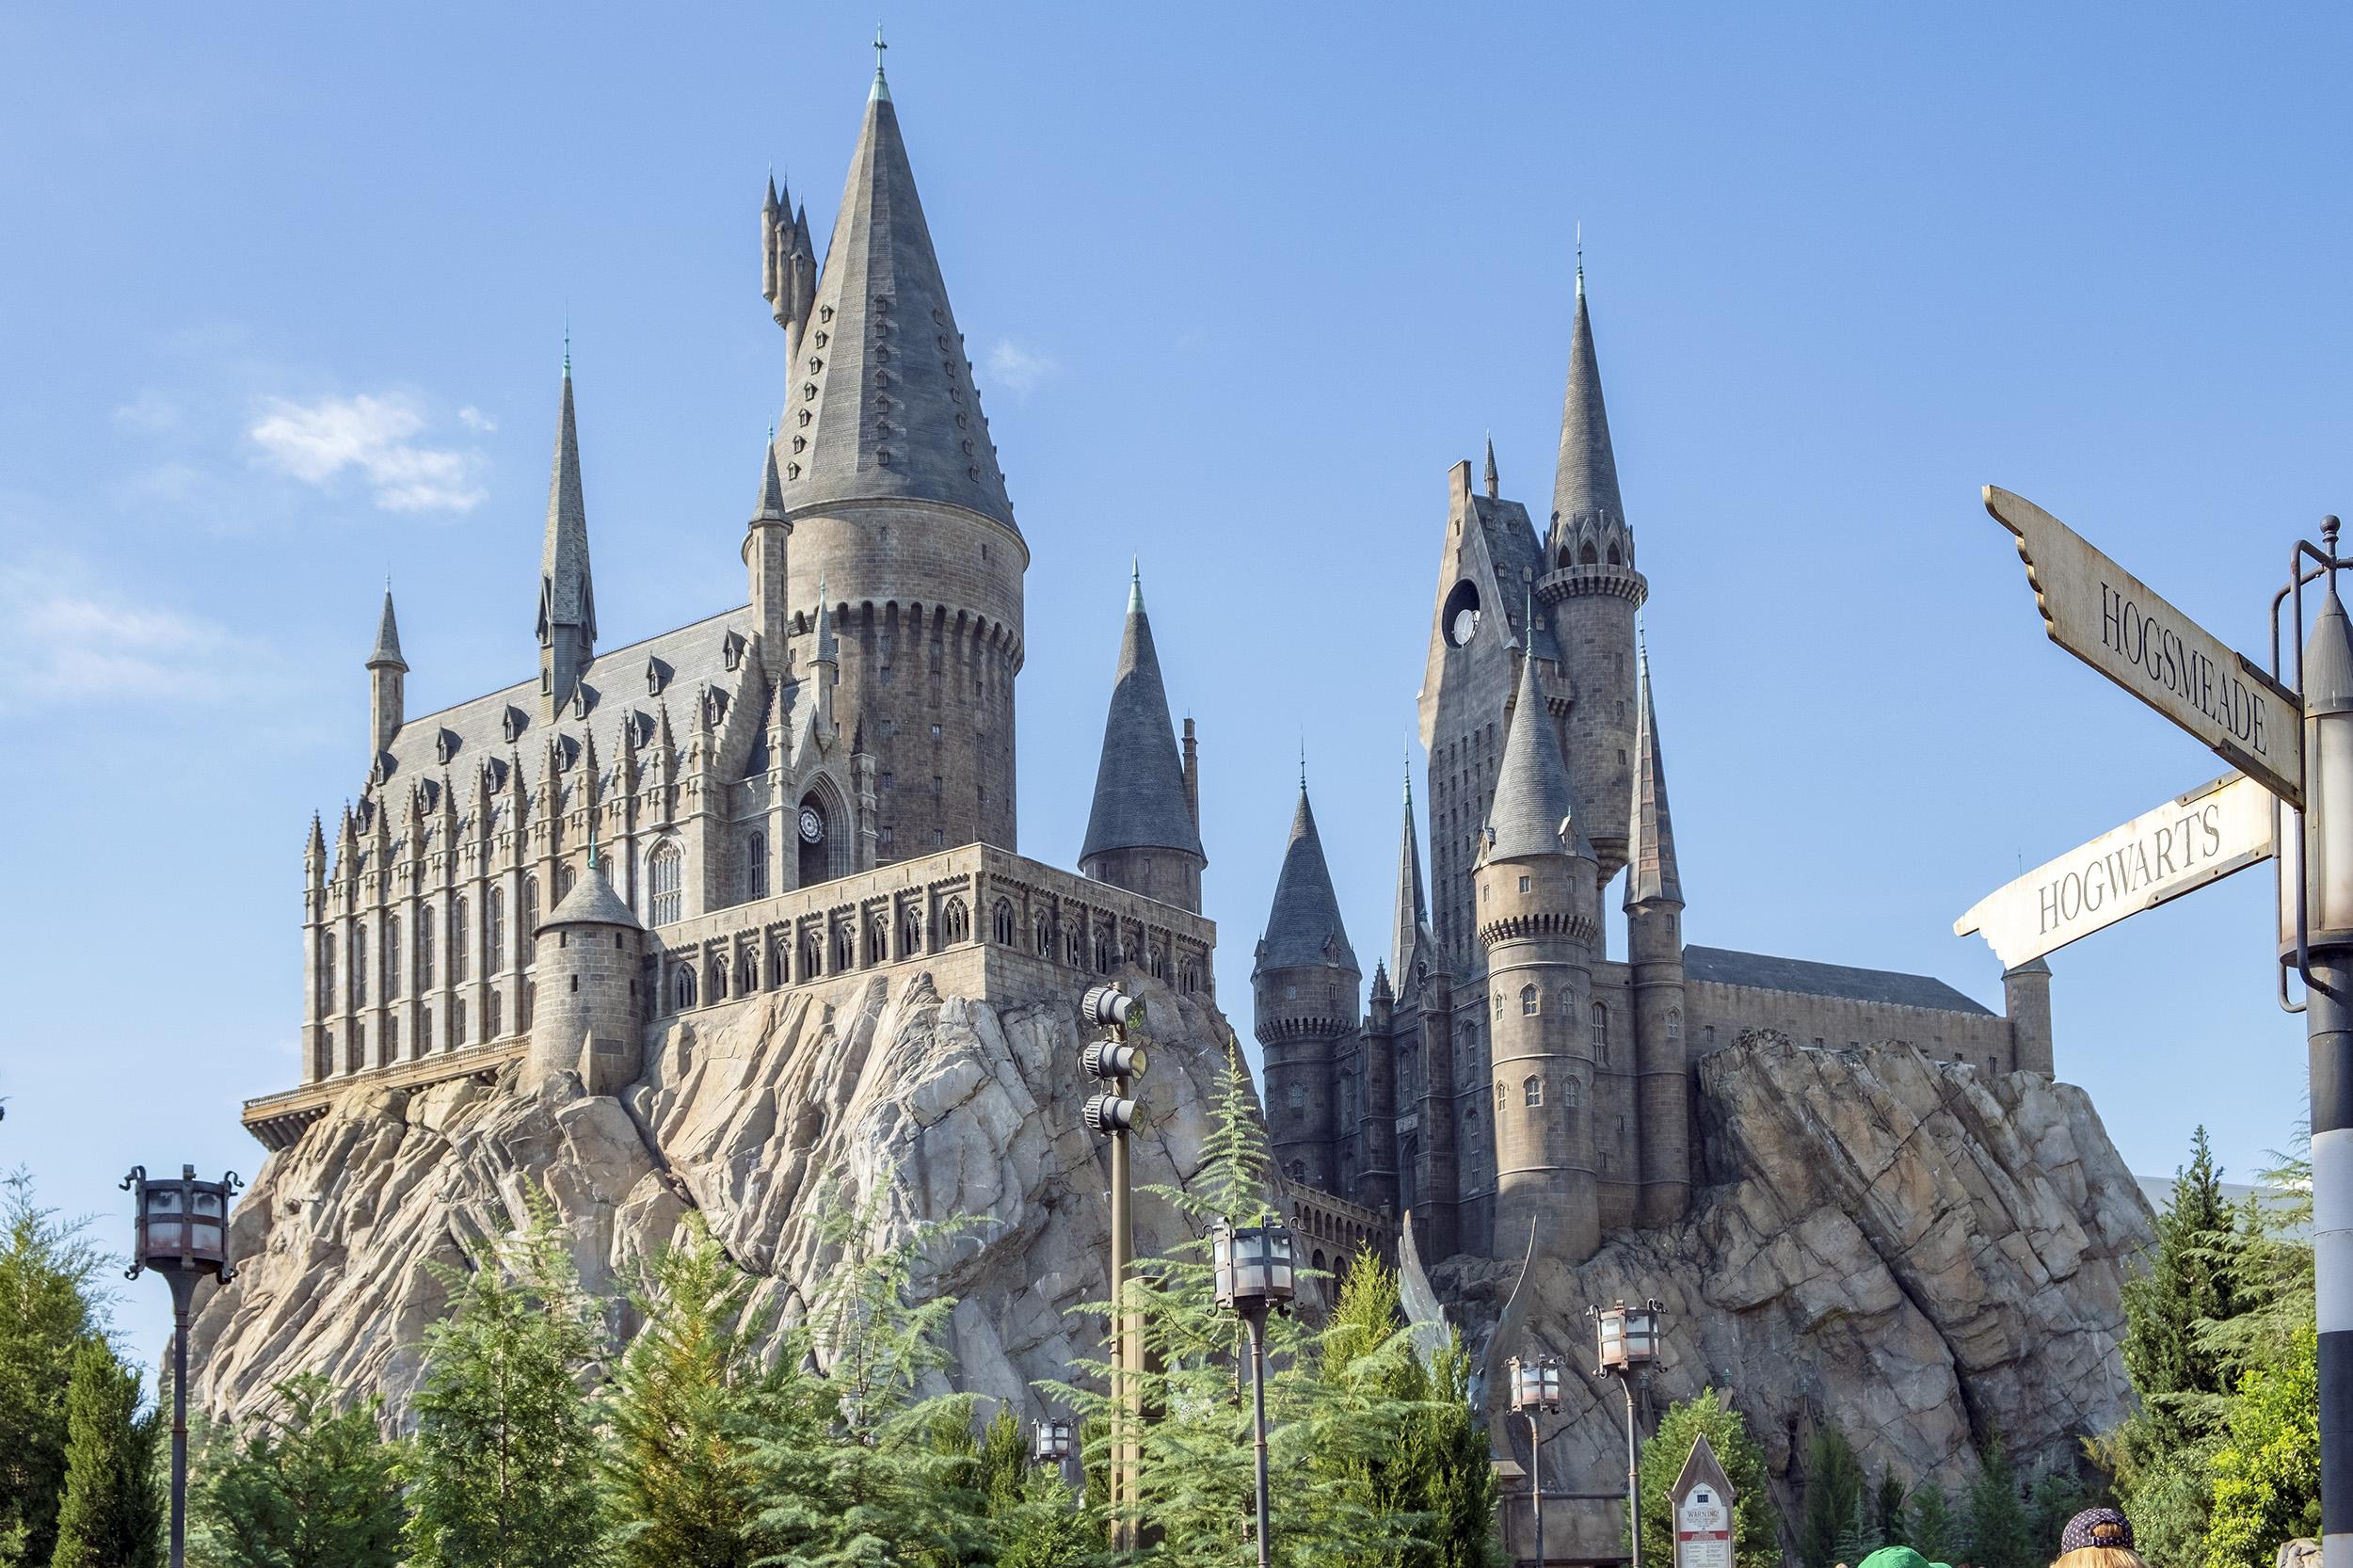 Hogwarts Castle i Wizarding World of Harry Potter